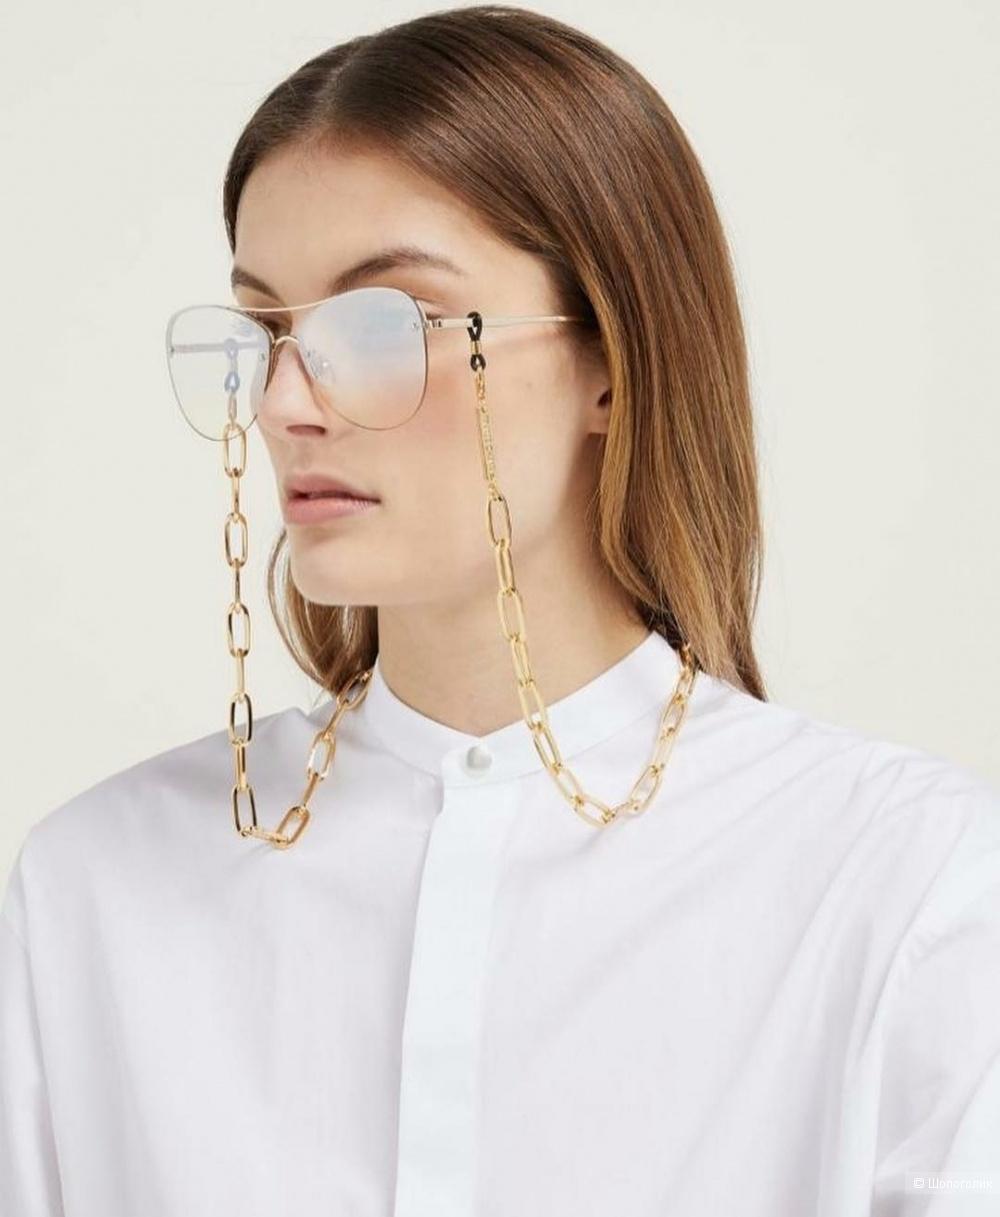 Цепочка для очков Frame Chain one size